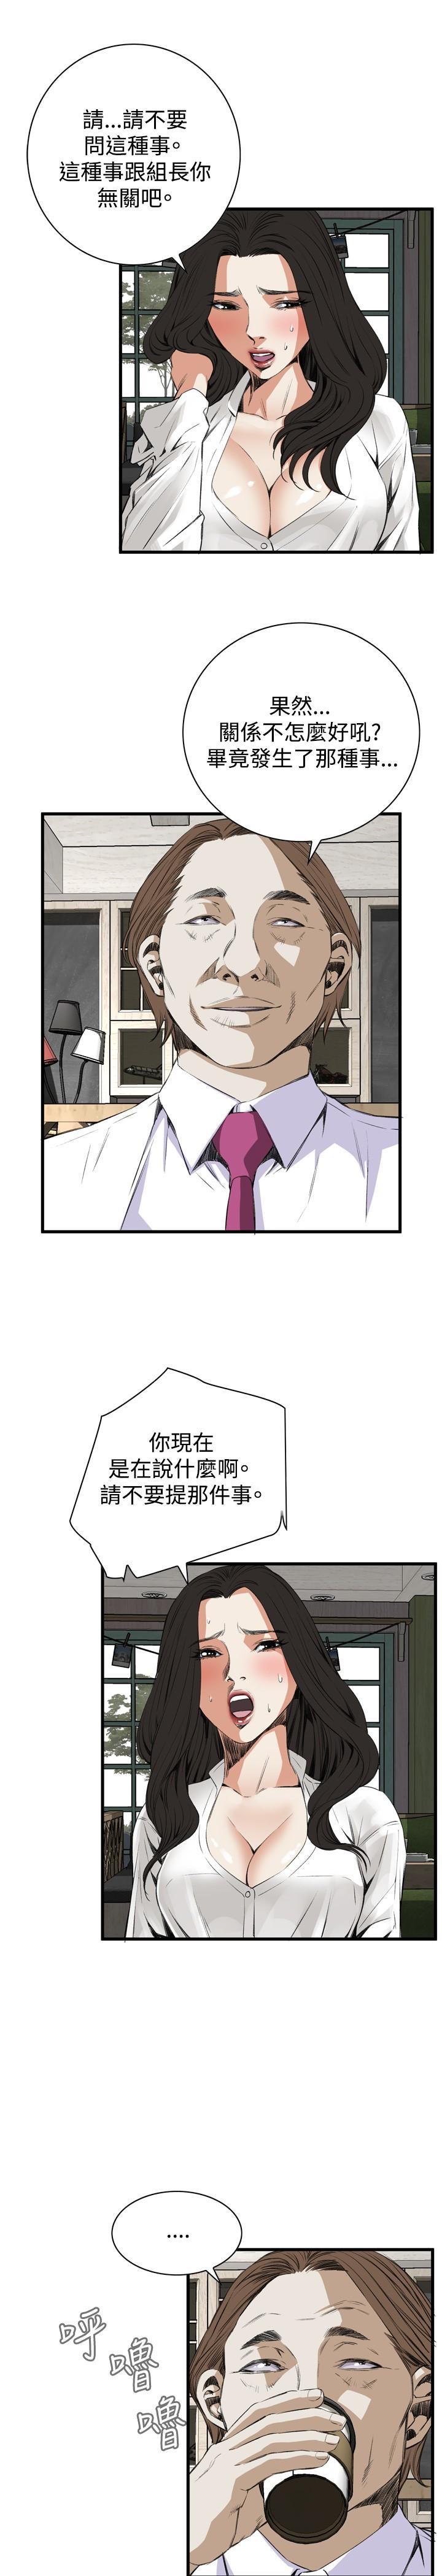 Take a Peek 偷窥 Ch.39~55 [Chinese]中文 264